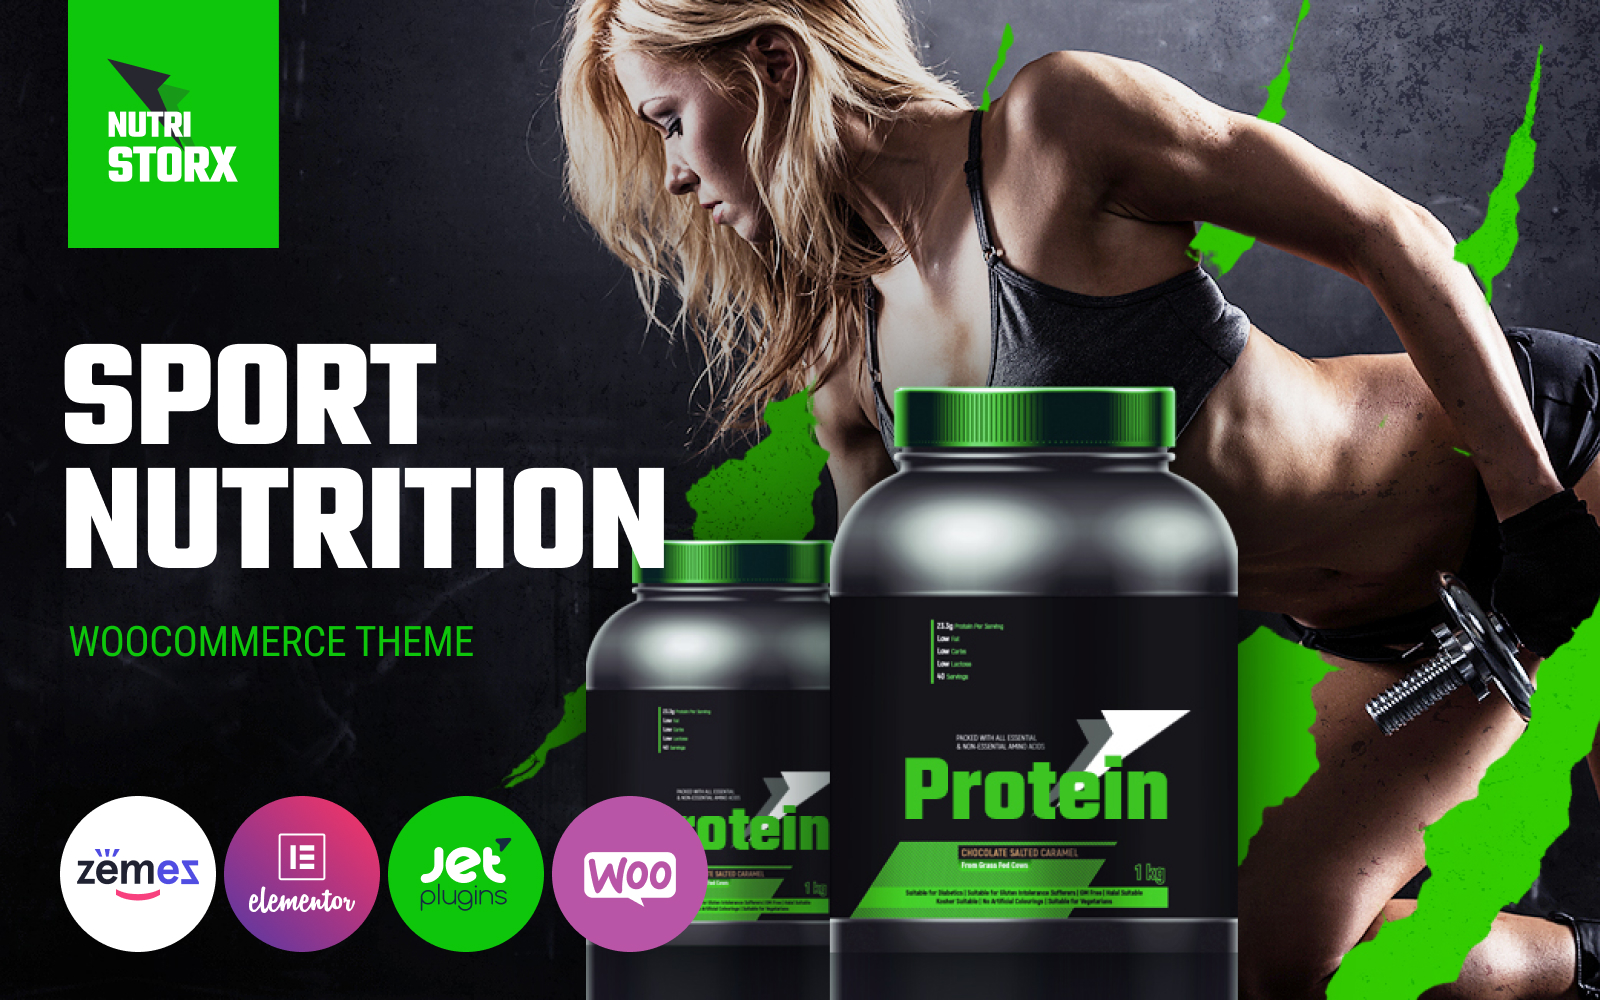 NutriStorx - Sports Nutrition Shop Elementor WooCommerce Theme